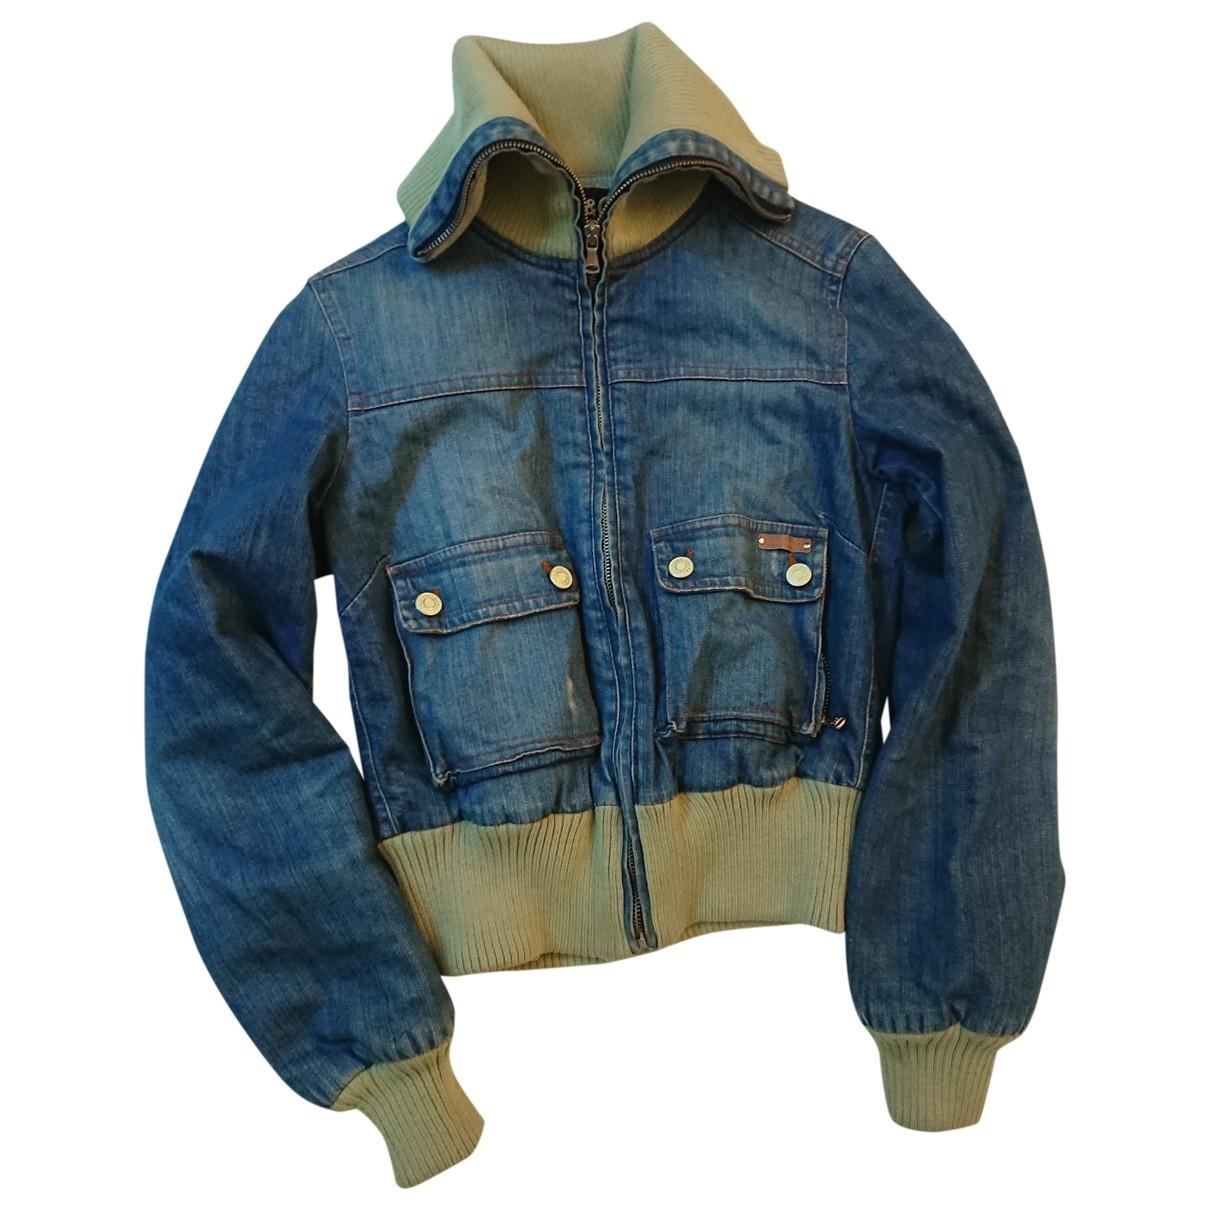 D&g \N Maentel in  Blau Denim - Jeans